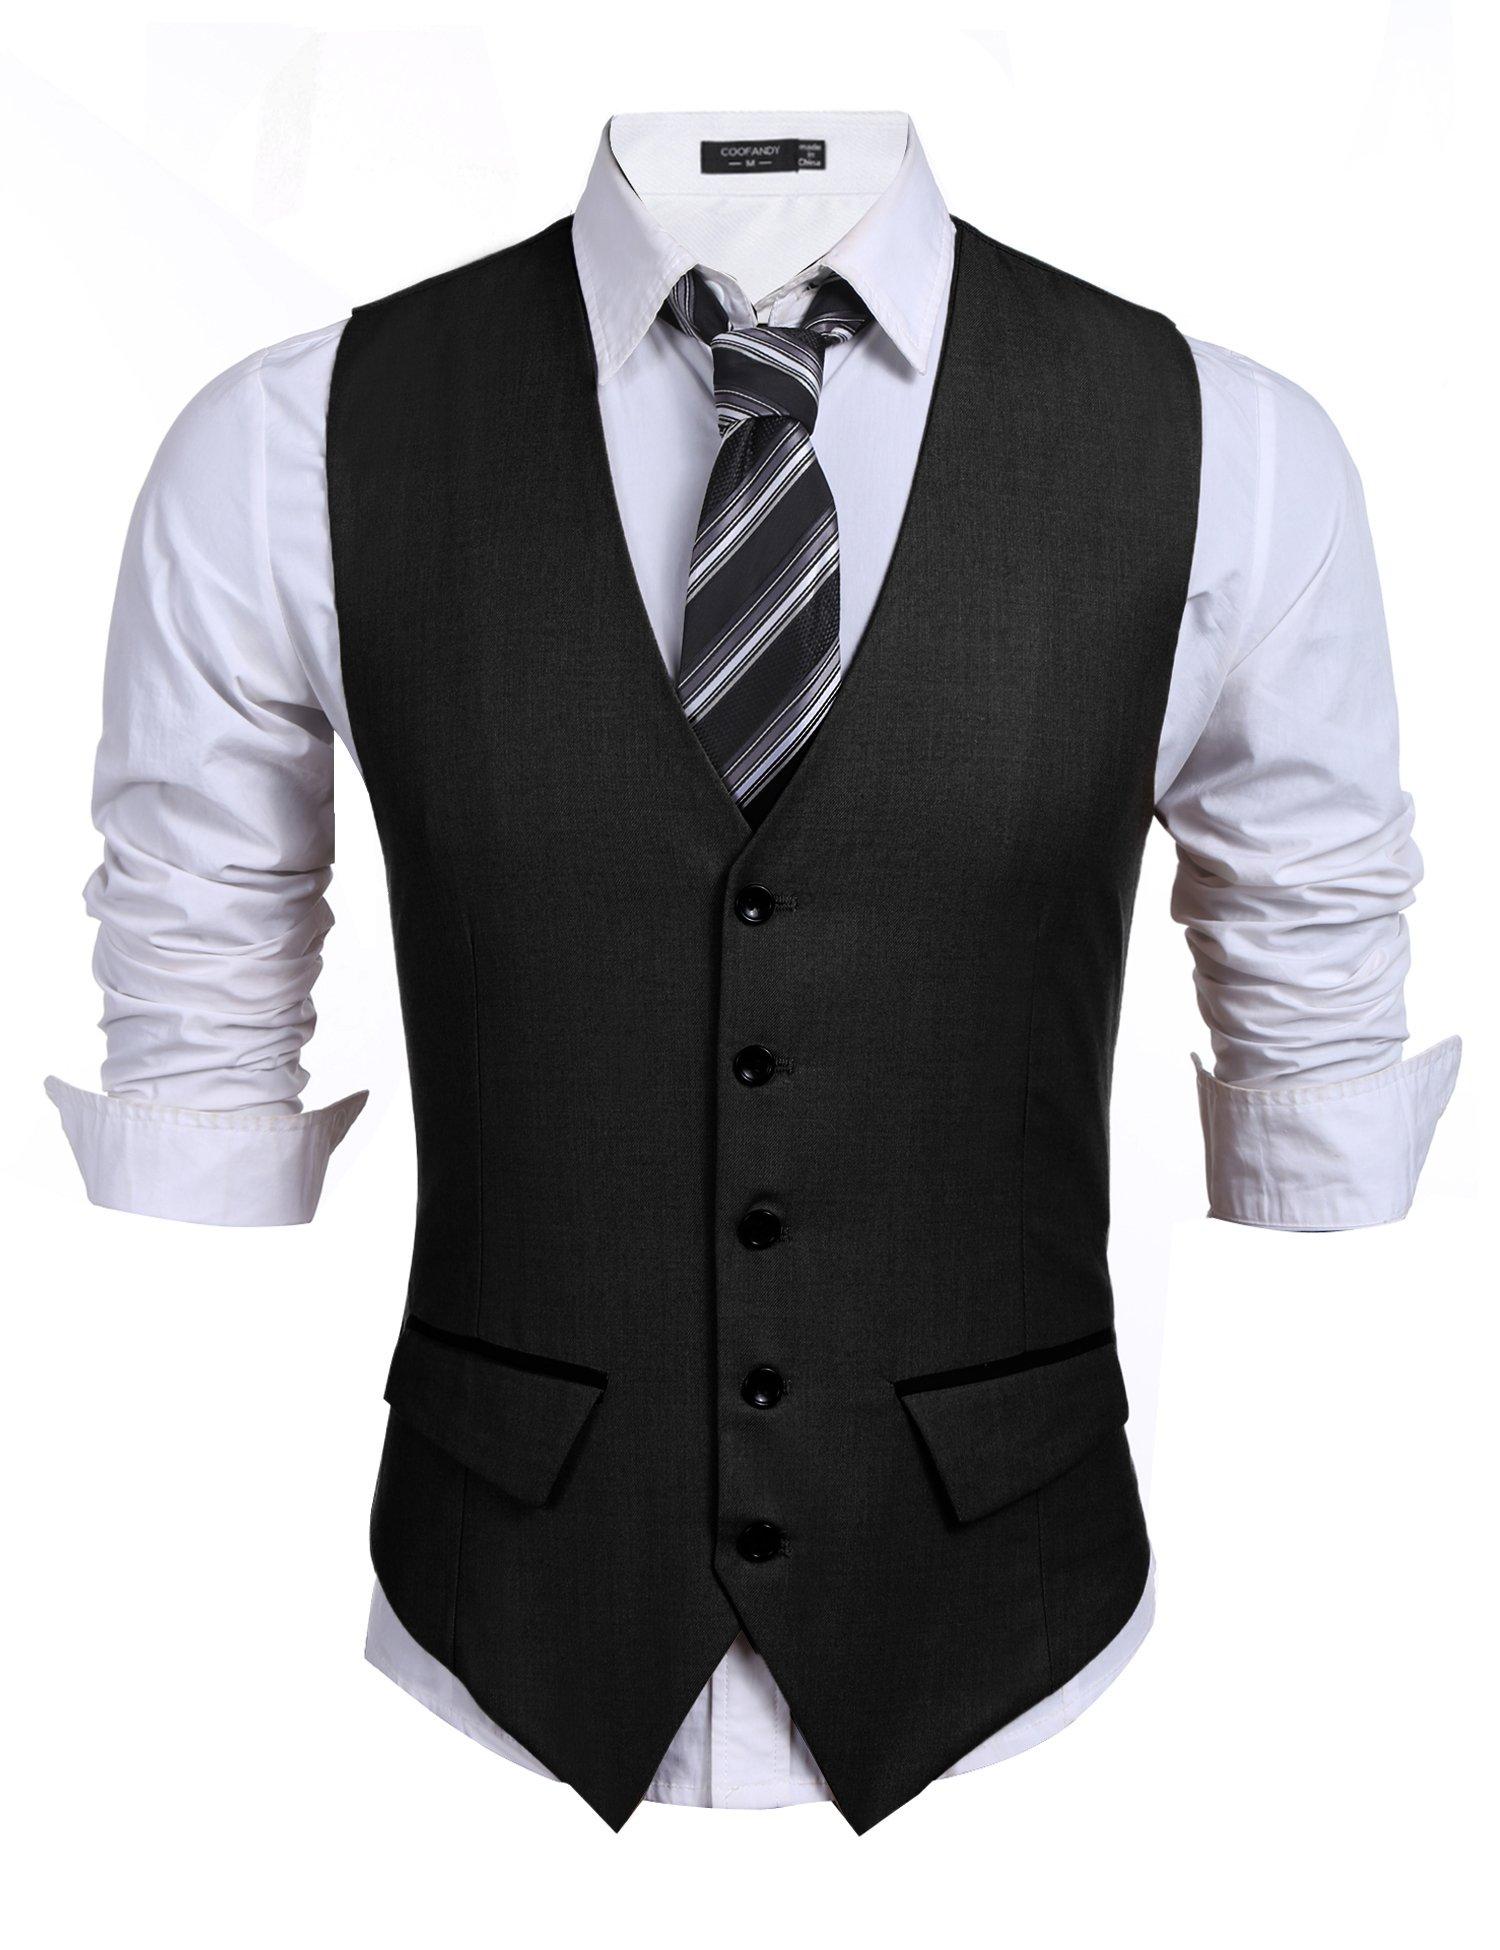 COOFANDY Men's Business Suit Vest,Slim Fit Skinny Wedding Waistcoat (Medium, Black by COOFANDY